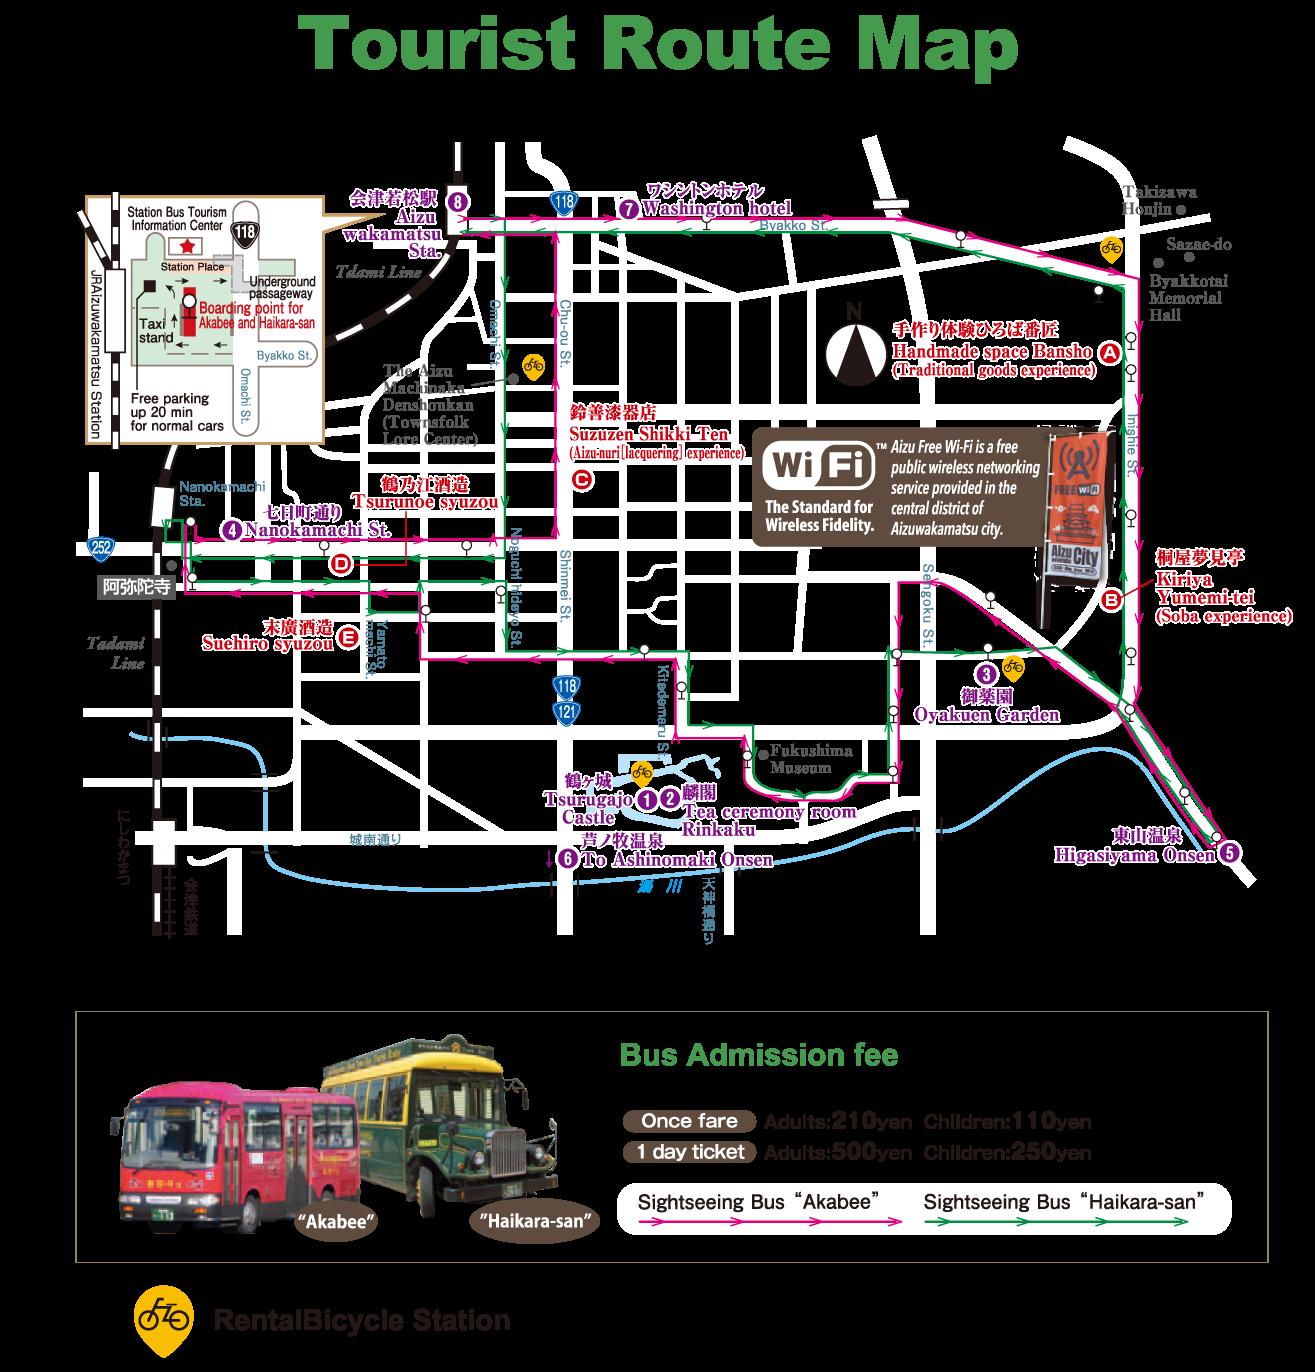 tourist route map